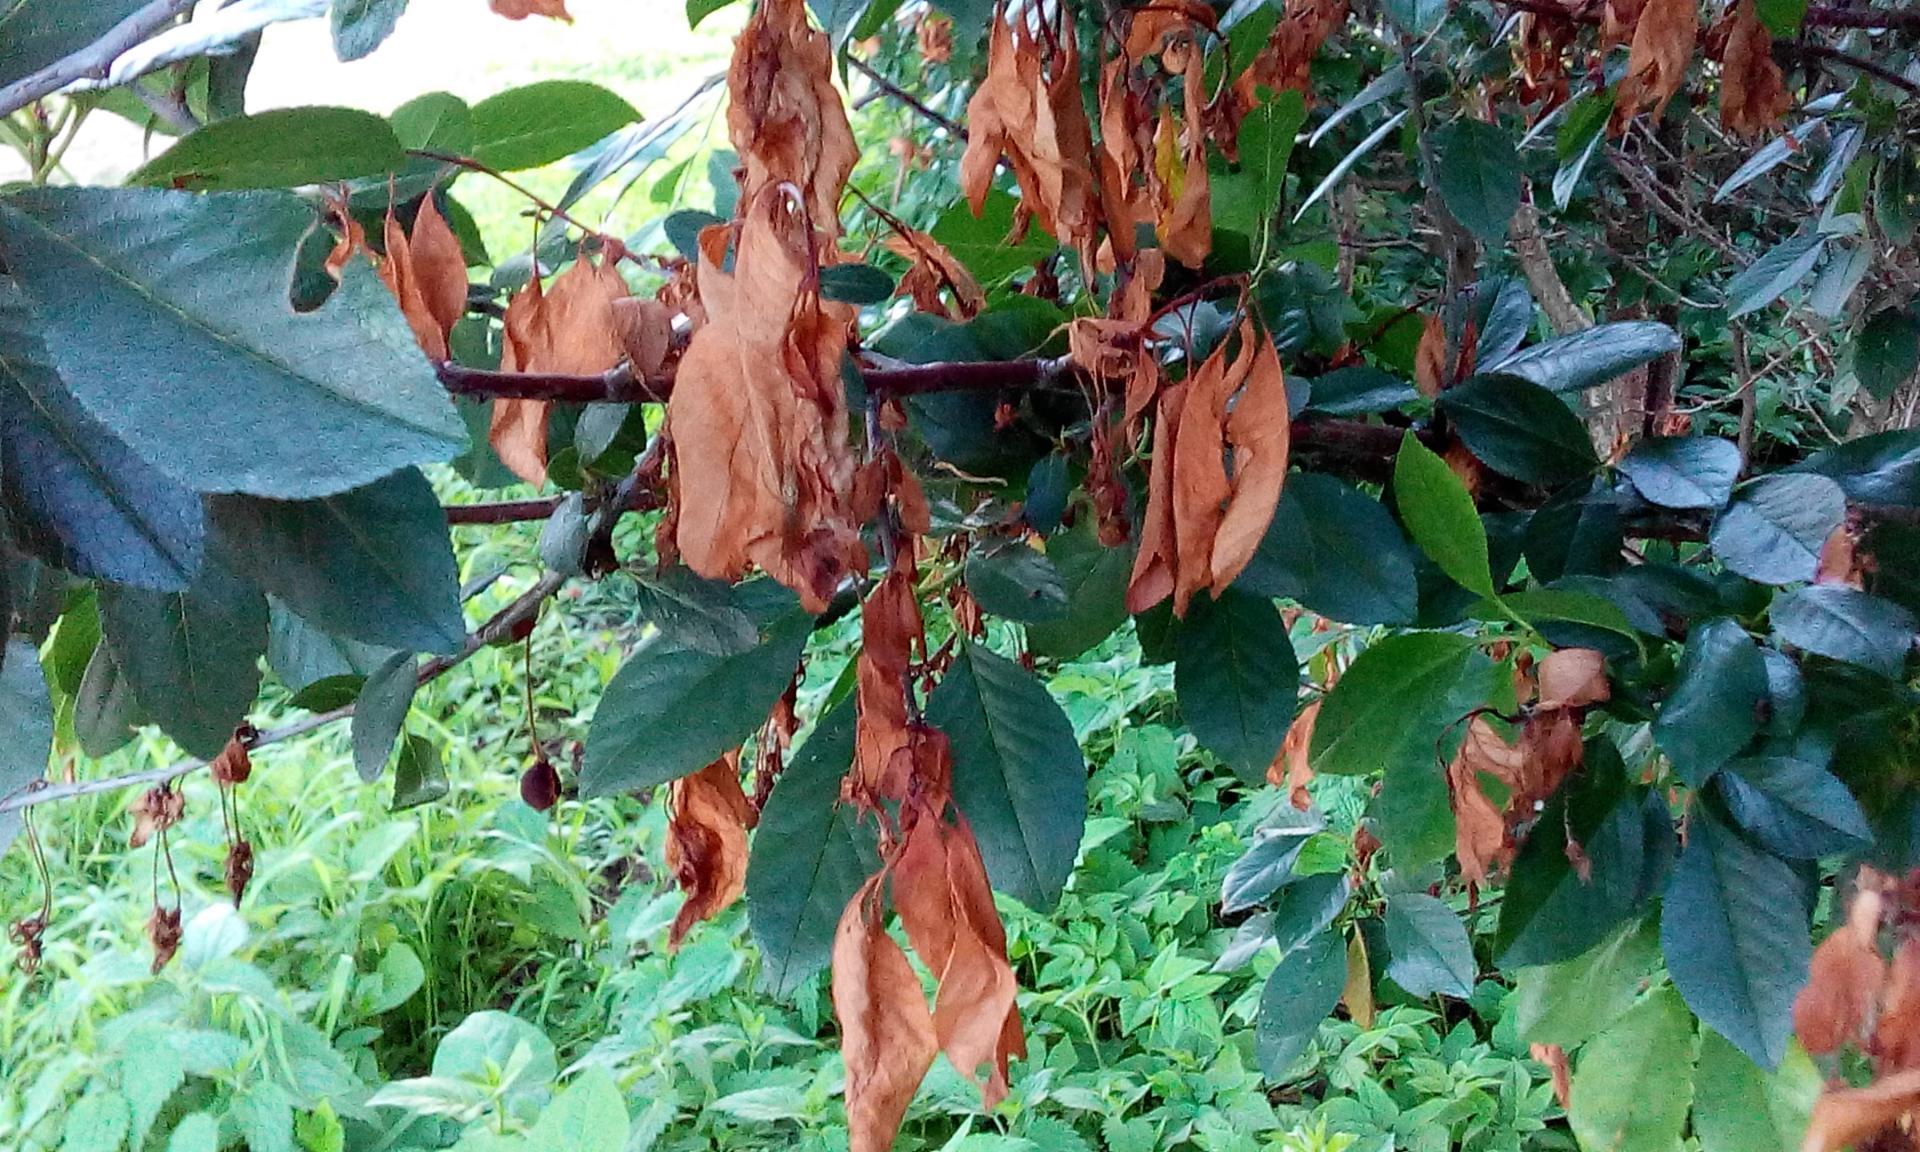 Болезни яблони: описание с фото и лечение, названия заболеваний листьев, ствола и плодов